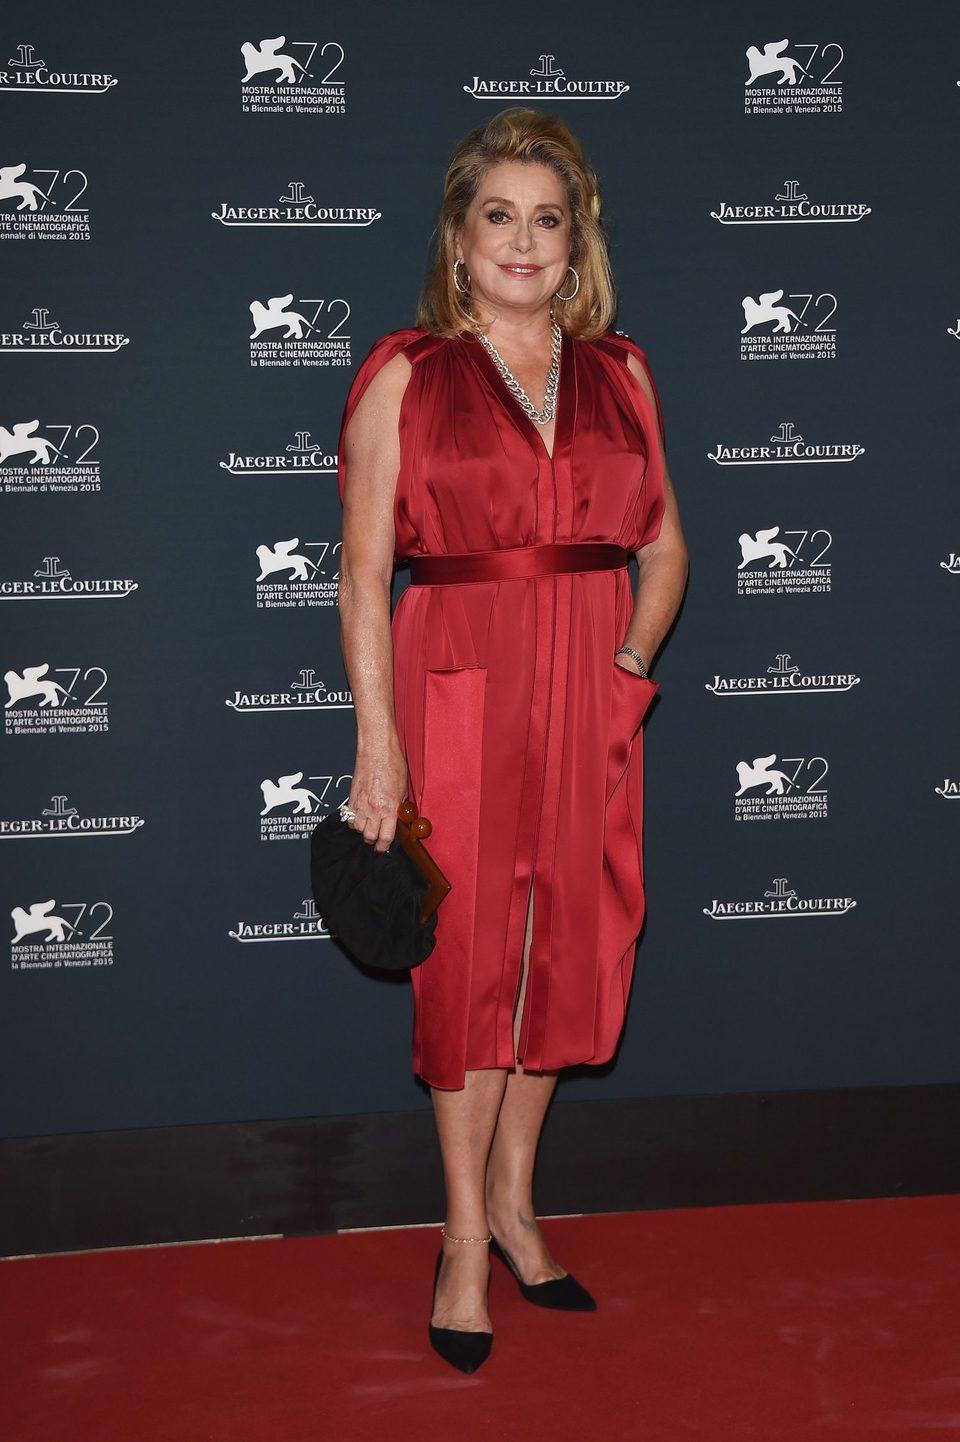 Catherine Deneuve at the 72nd Venice Film Festival